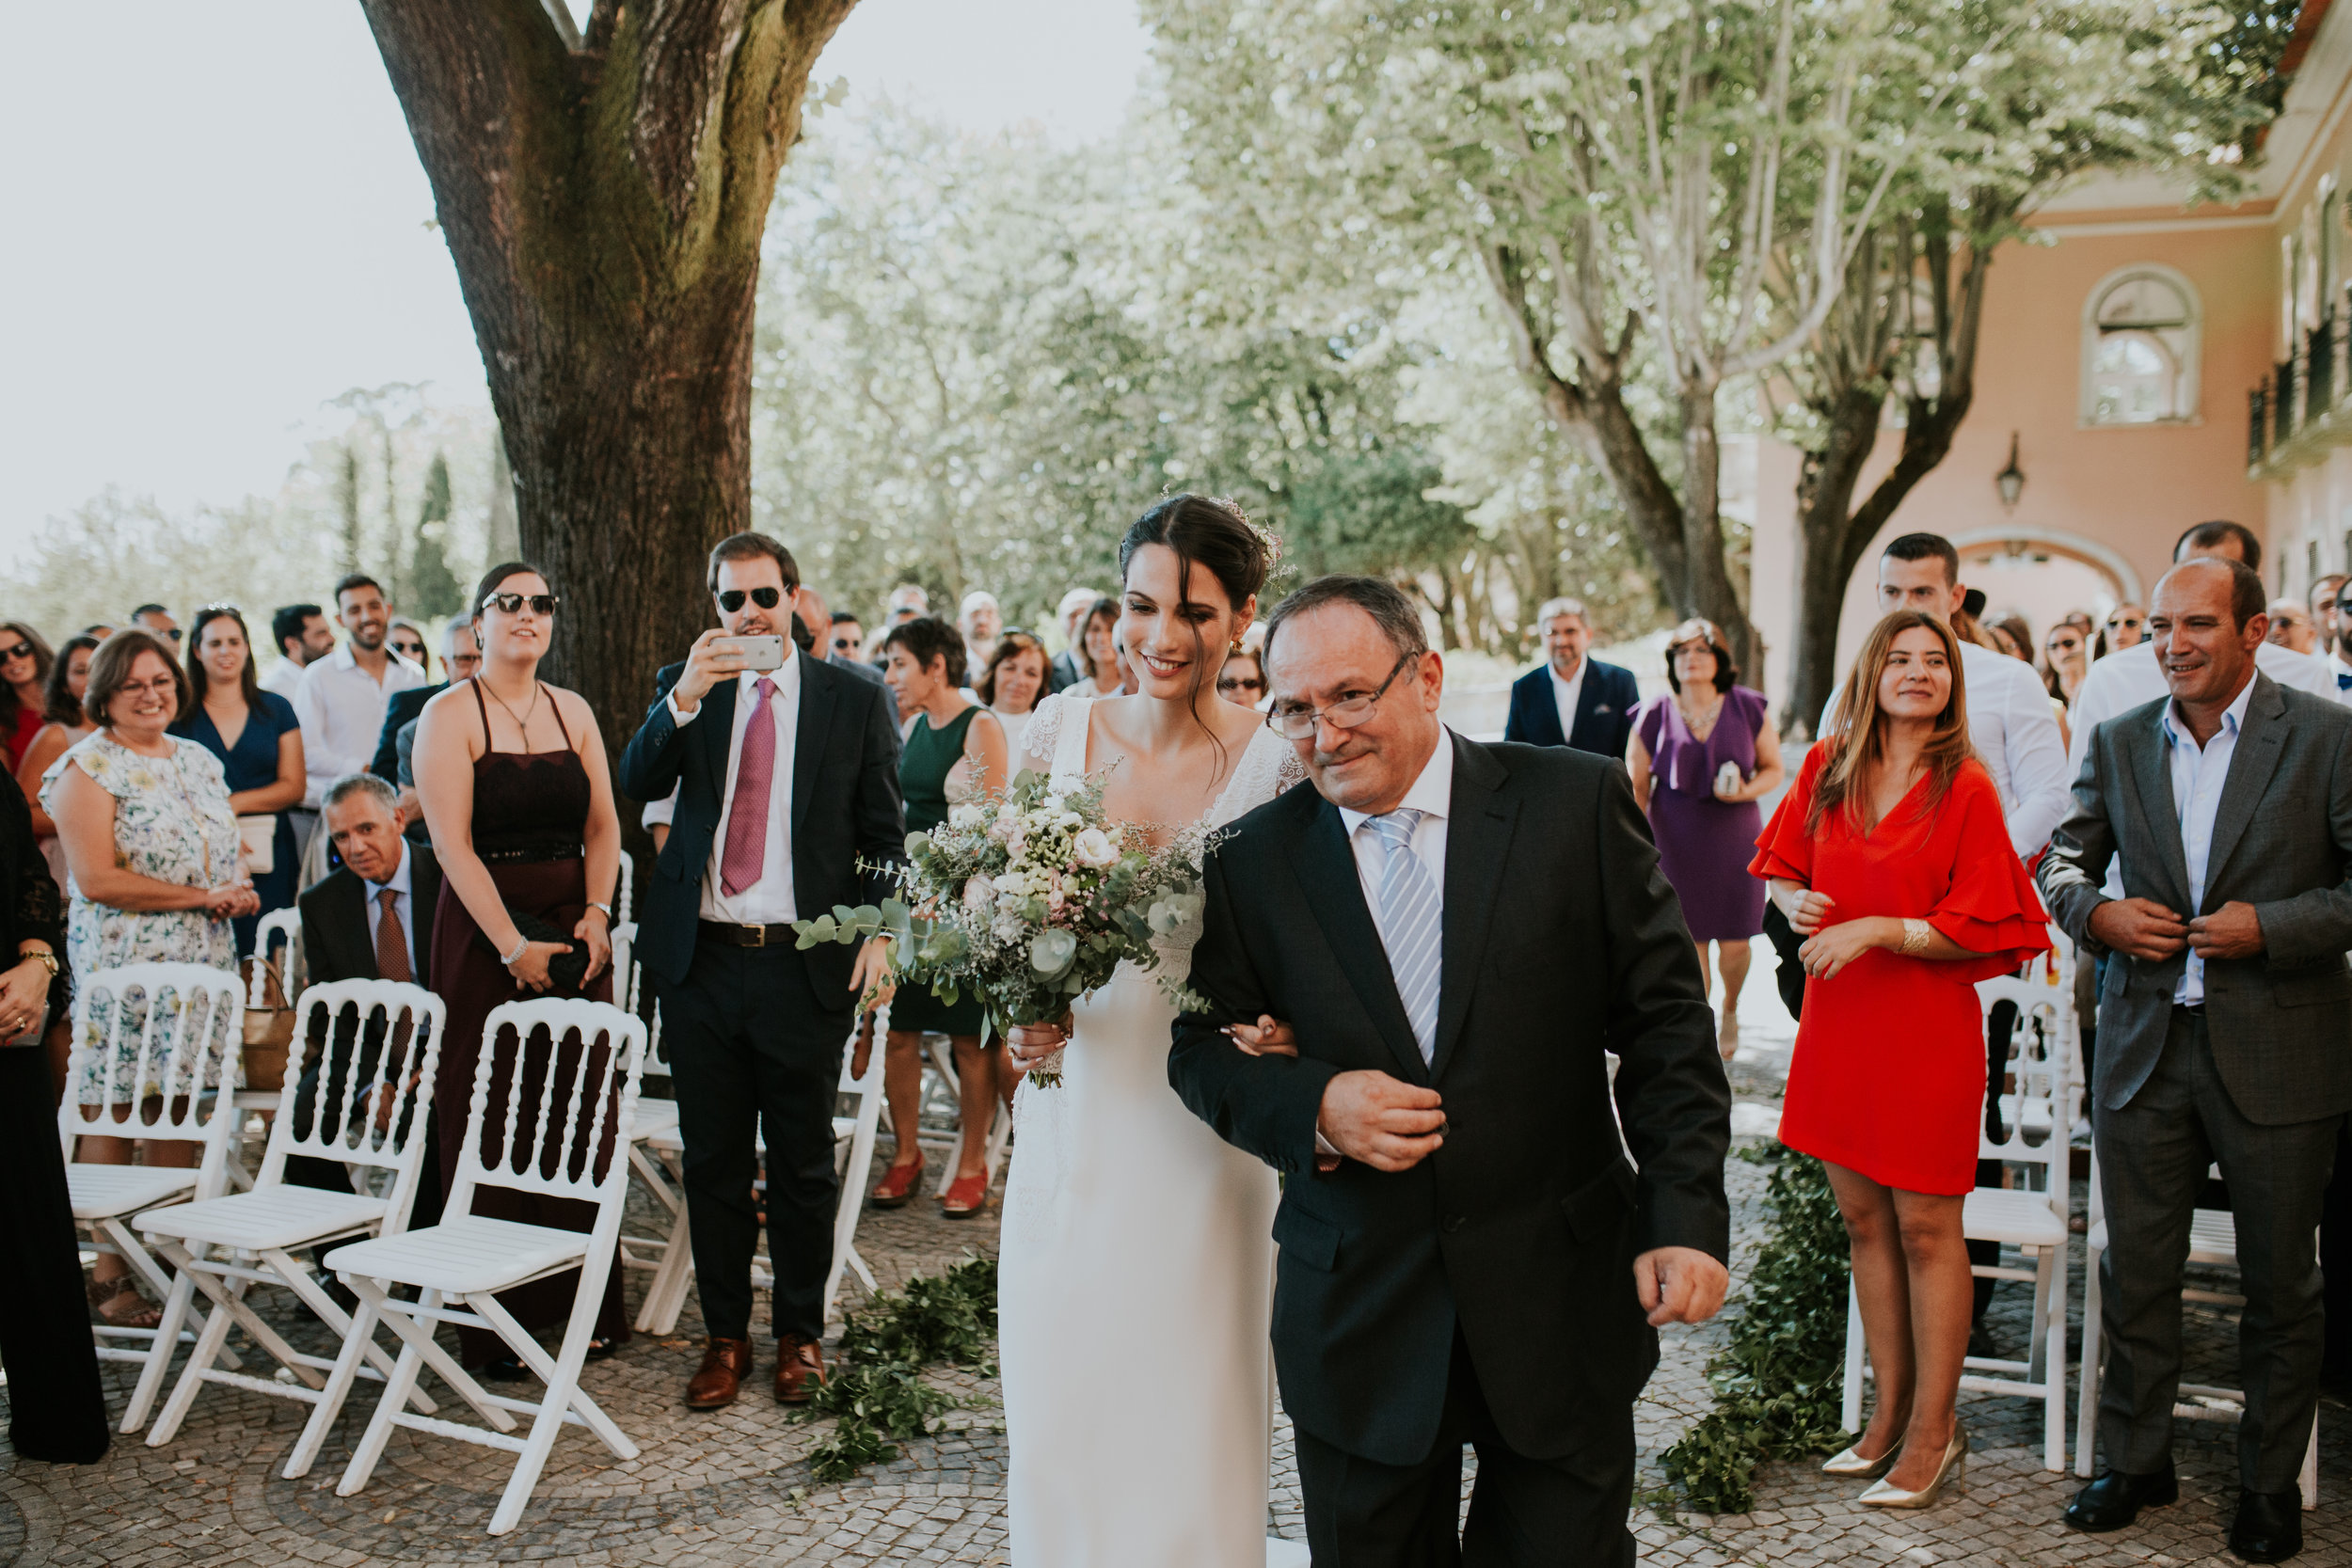 J&P 218_ 02 setembro 2017 Wedding day_.jpg